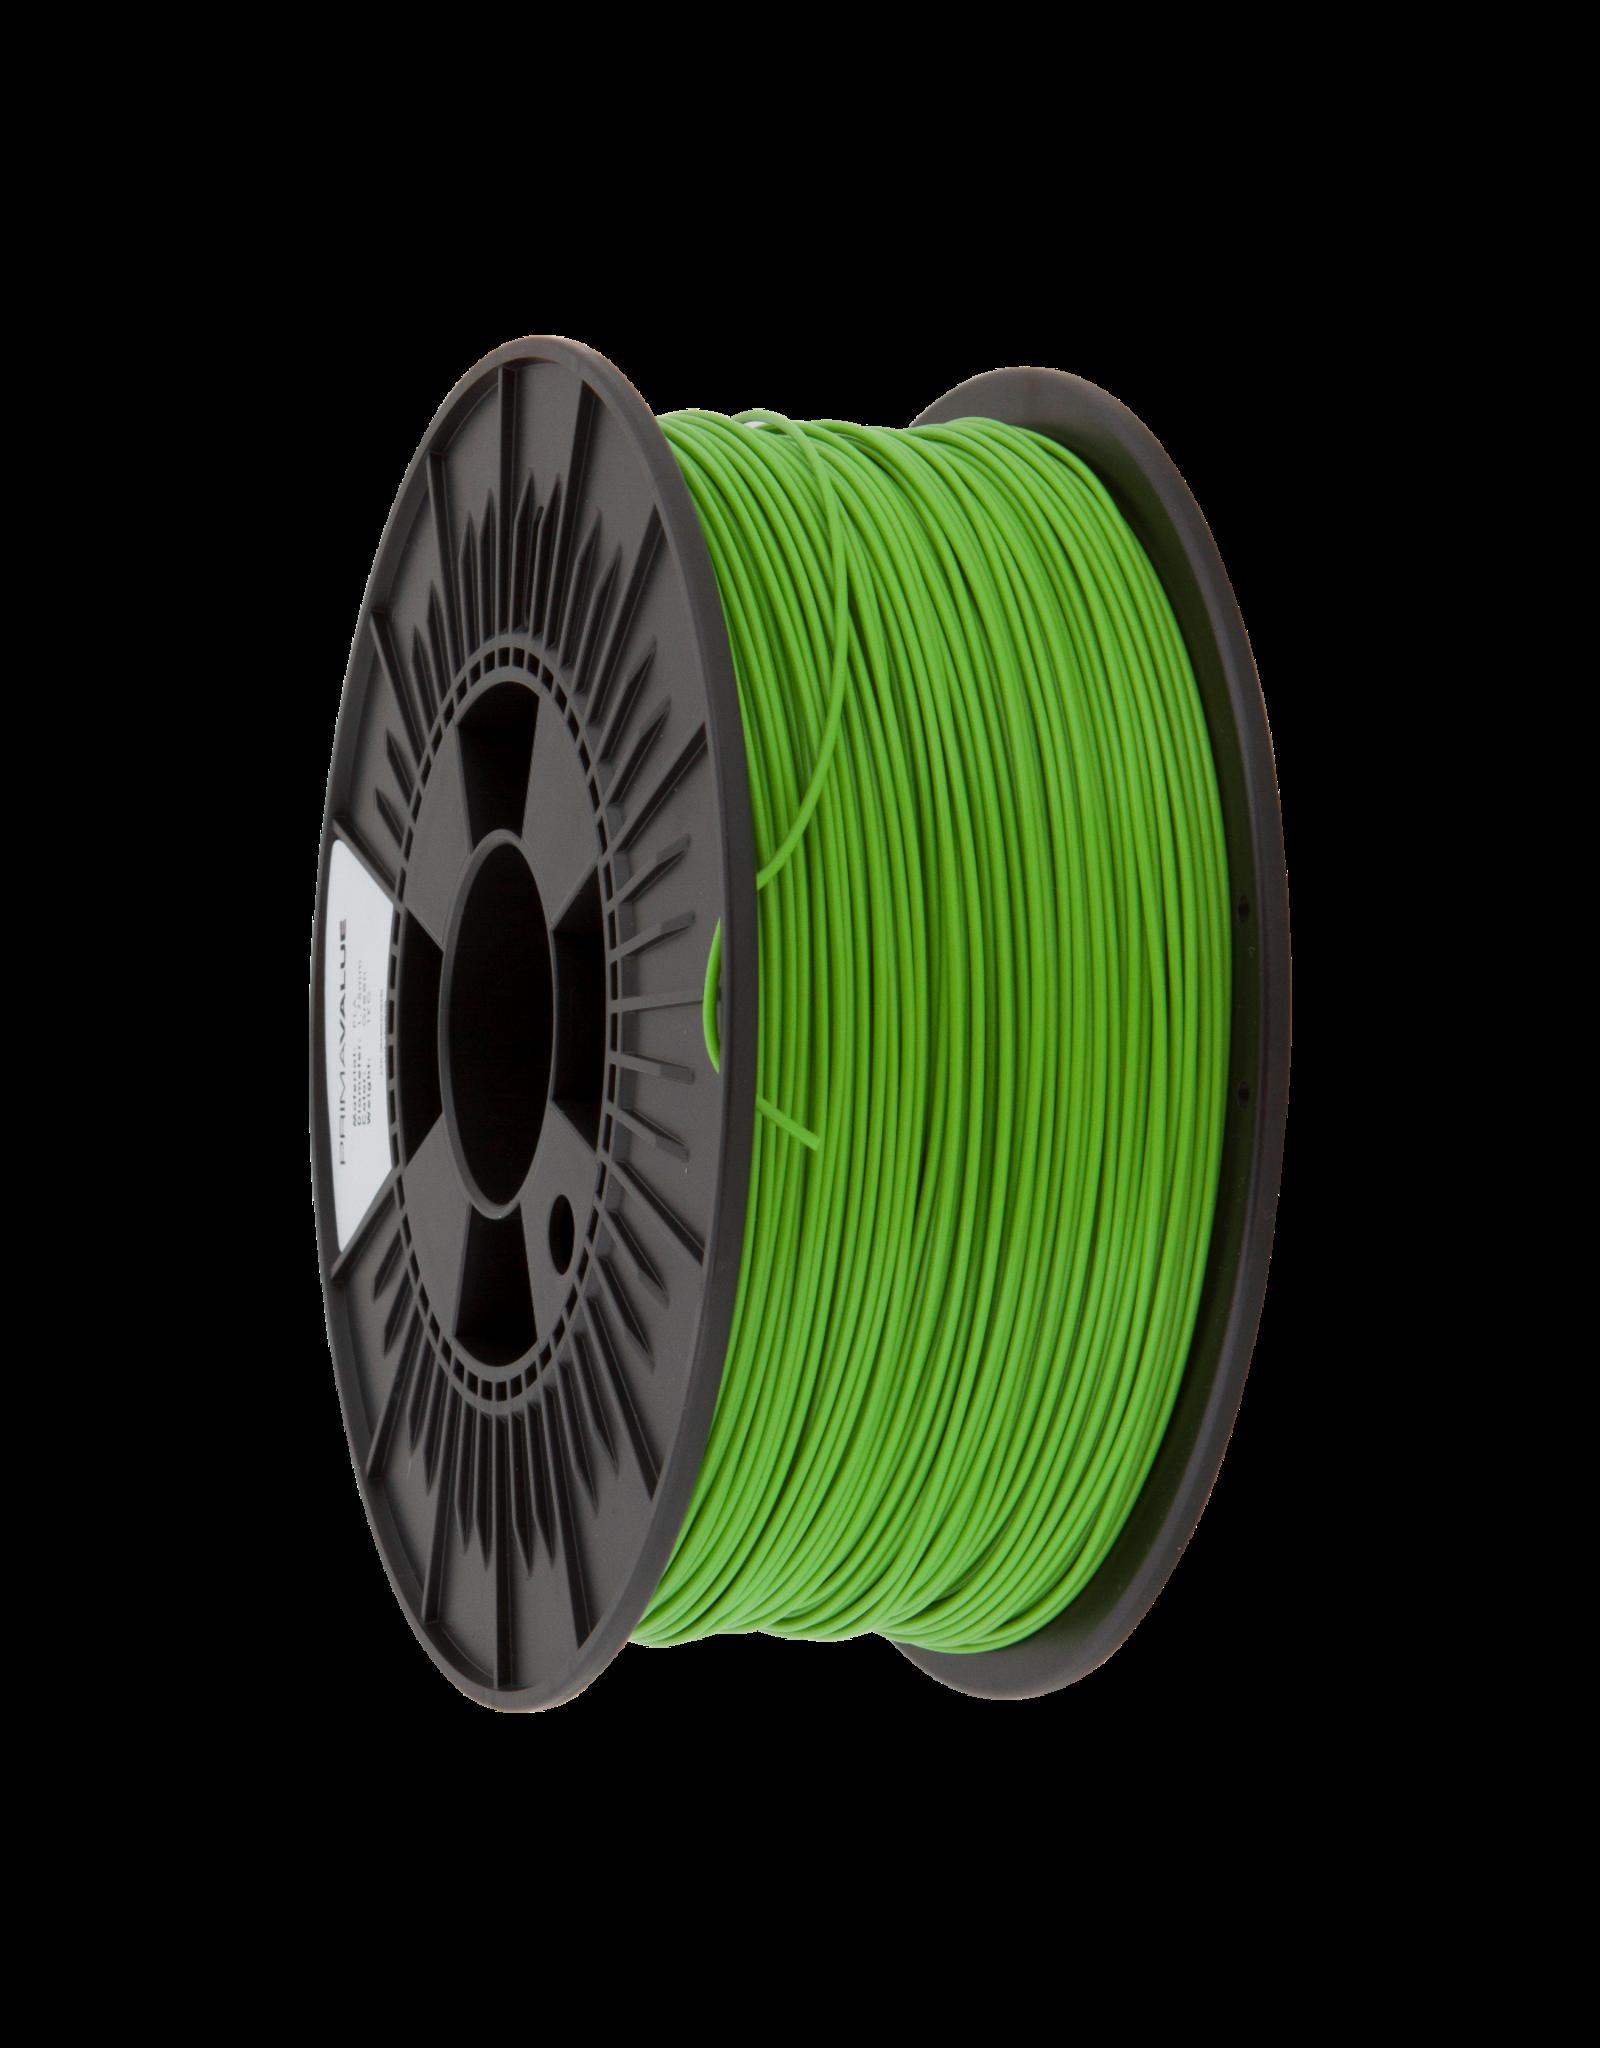 Prima PrimaValue ABS Filament - 1.75mm - 1 kg - Groen